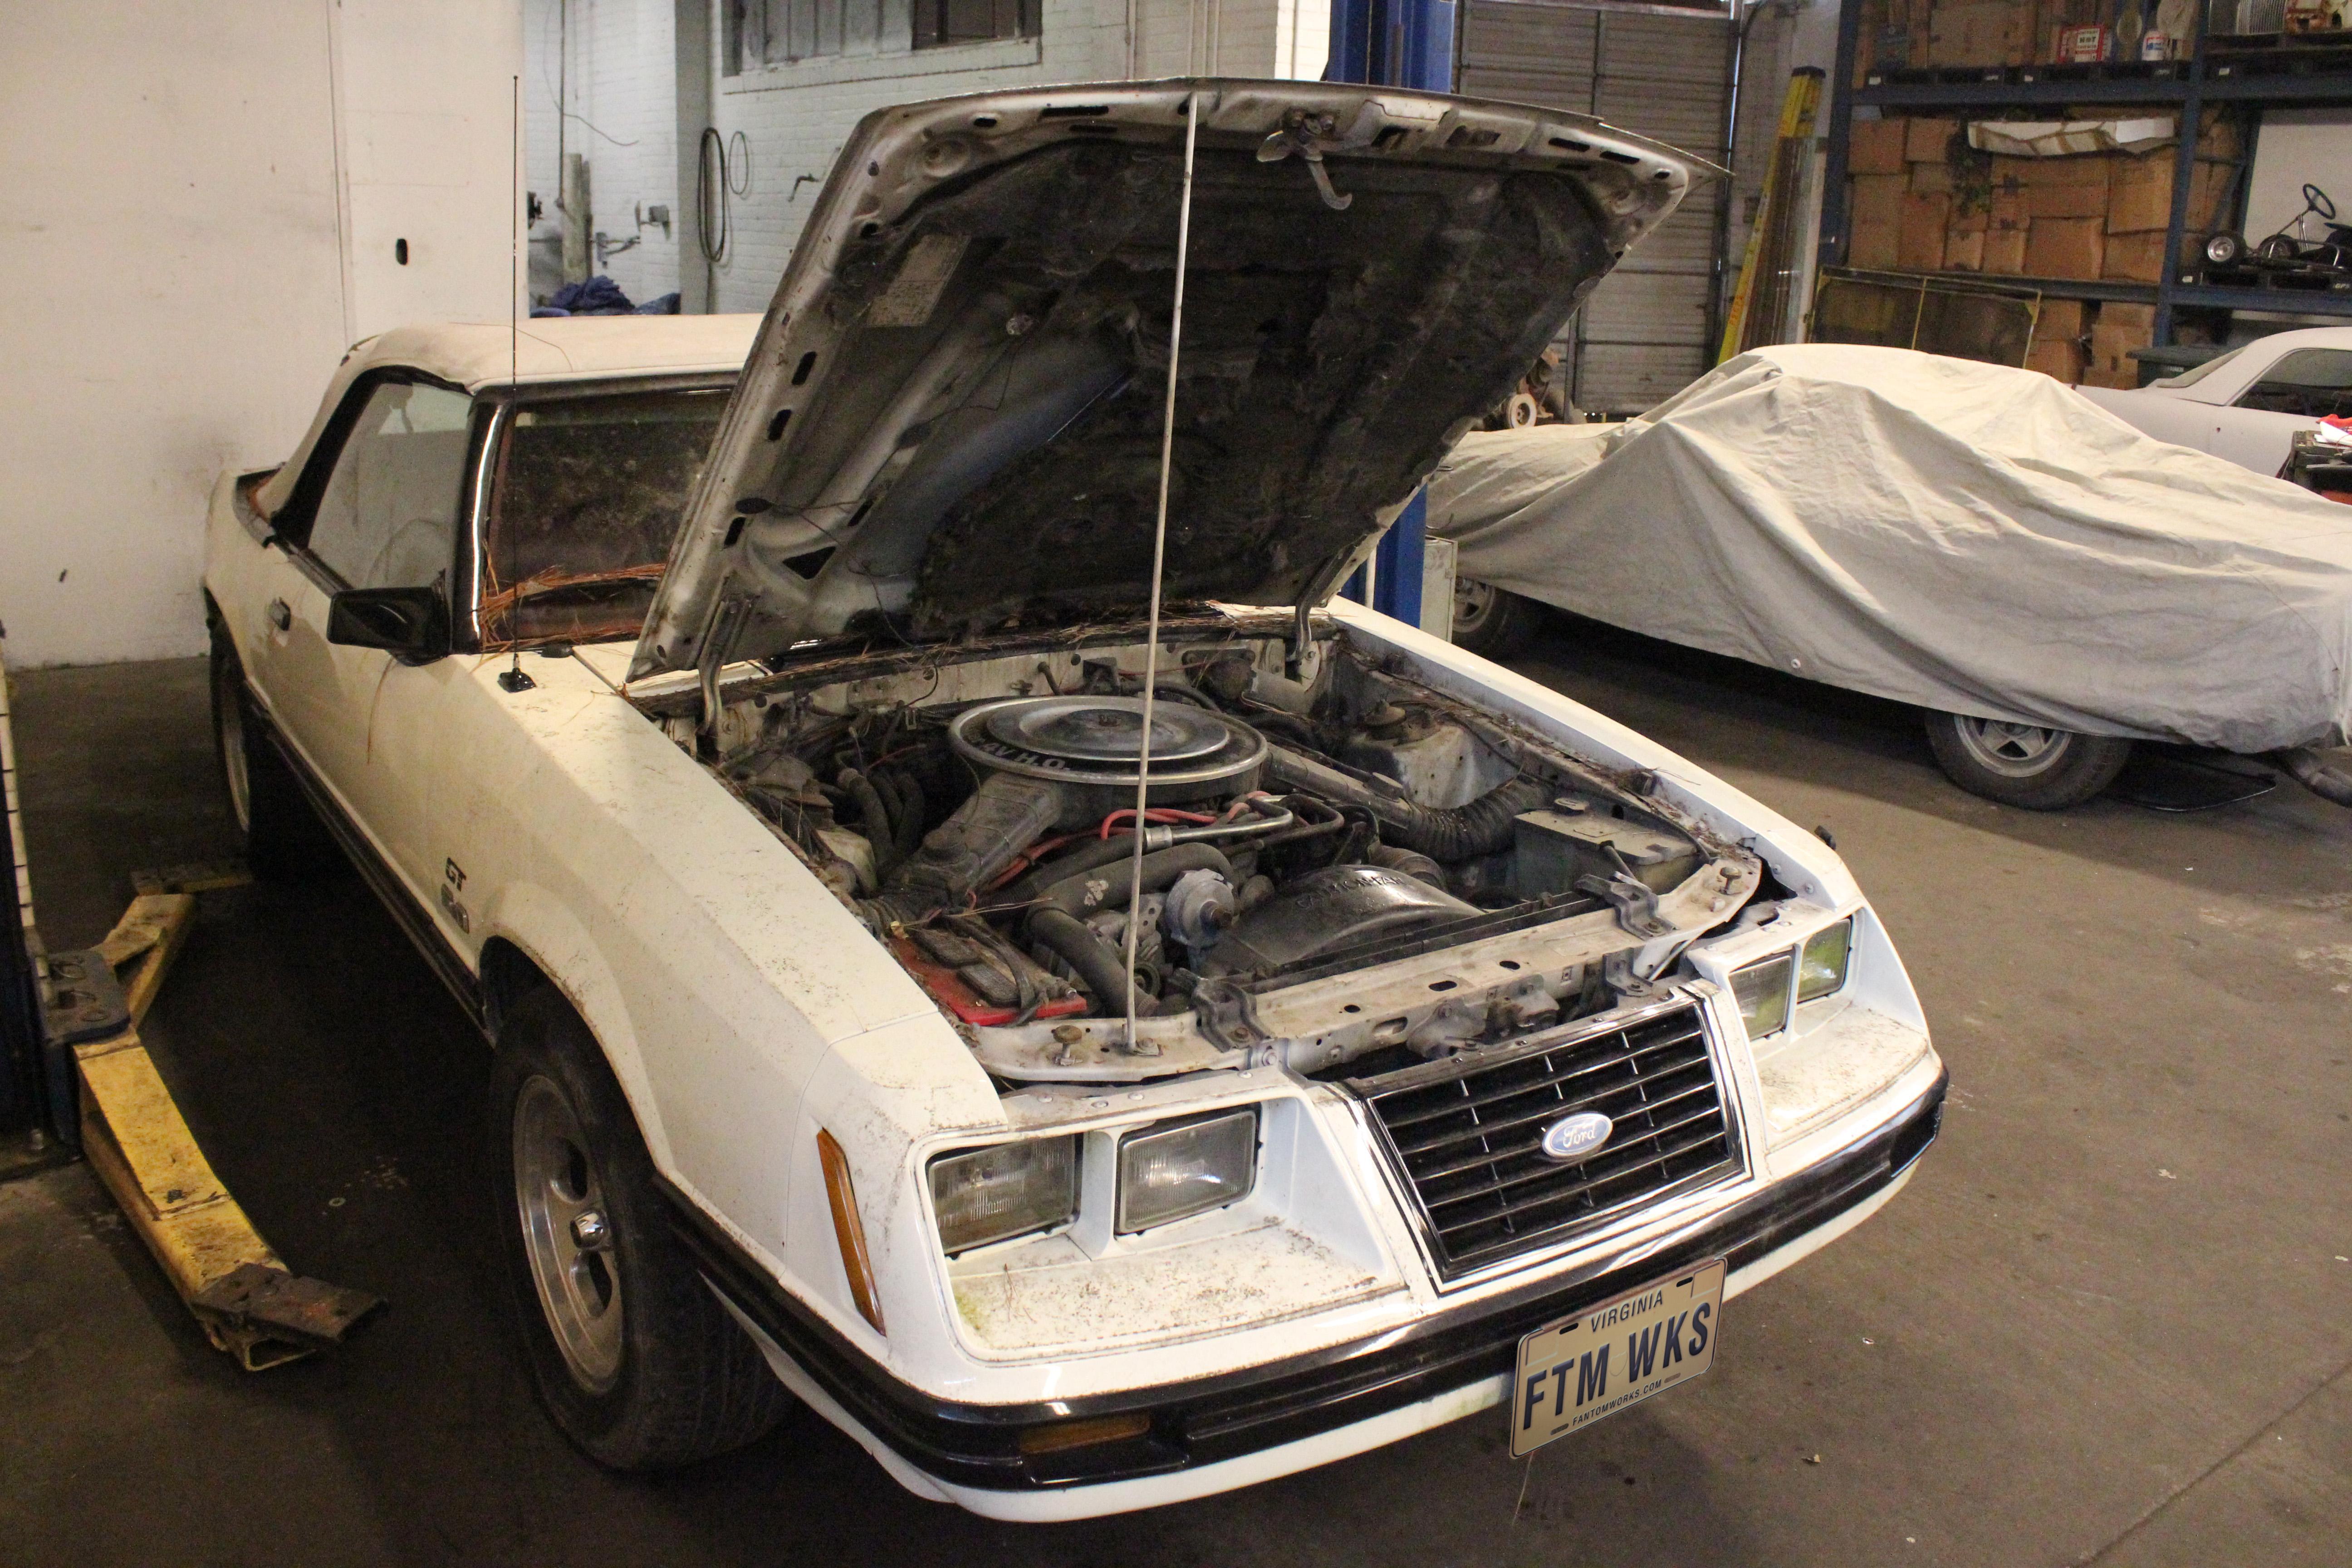 1983 Ford Mustang Gt Convertible Jo 01 Arrival 003 Fantomworks Engine